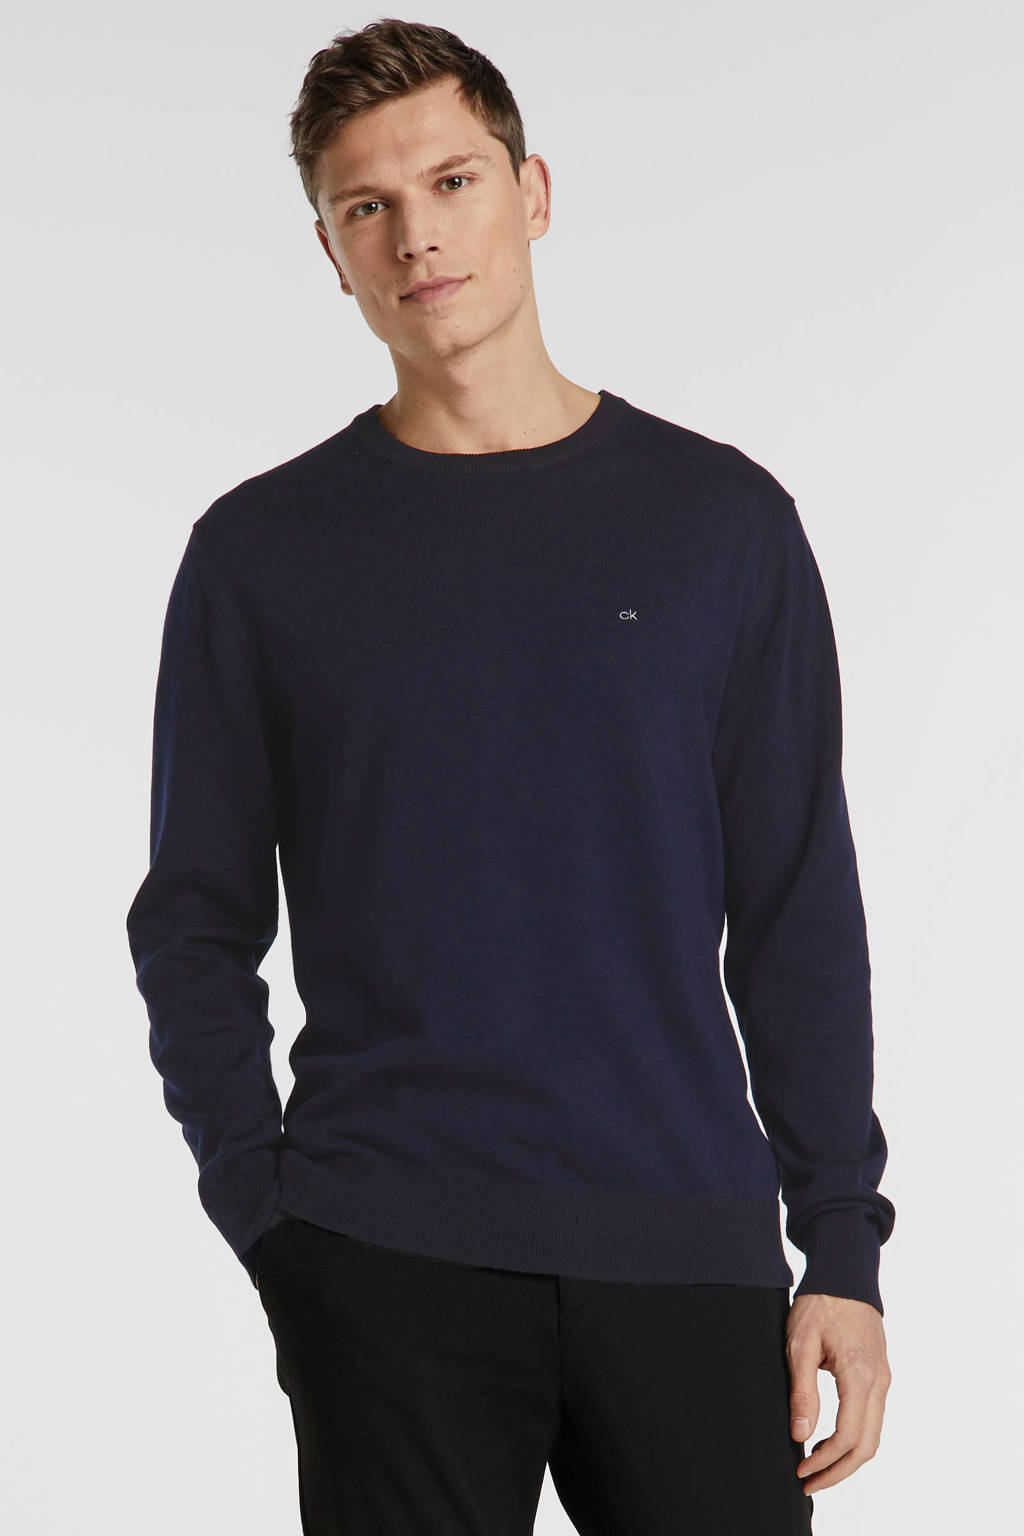 CALVIN KLEIN trui met logo zwart/wit, Zwart/wit